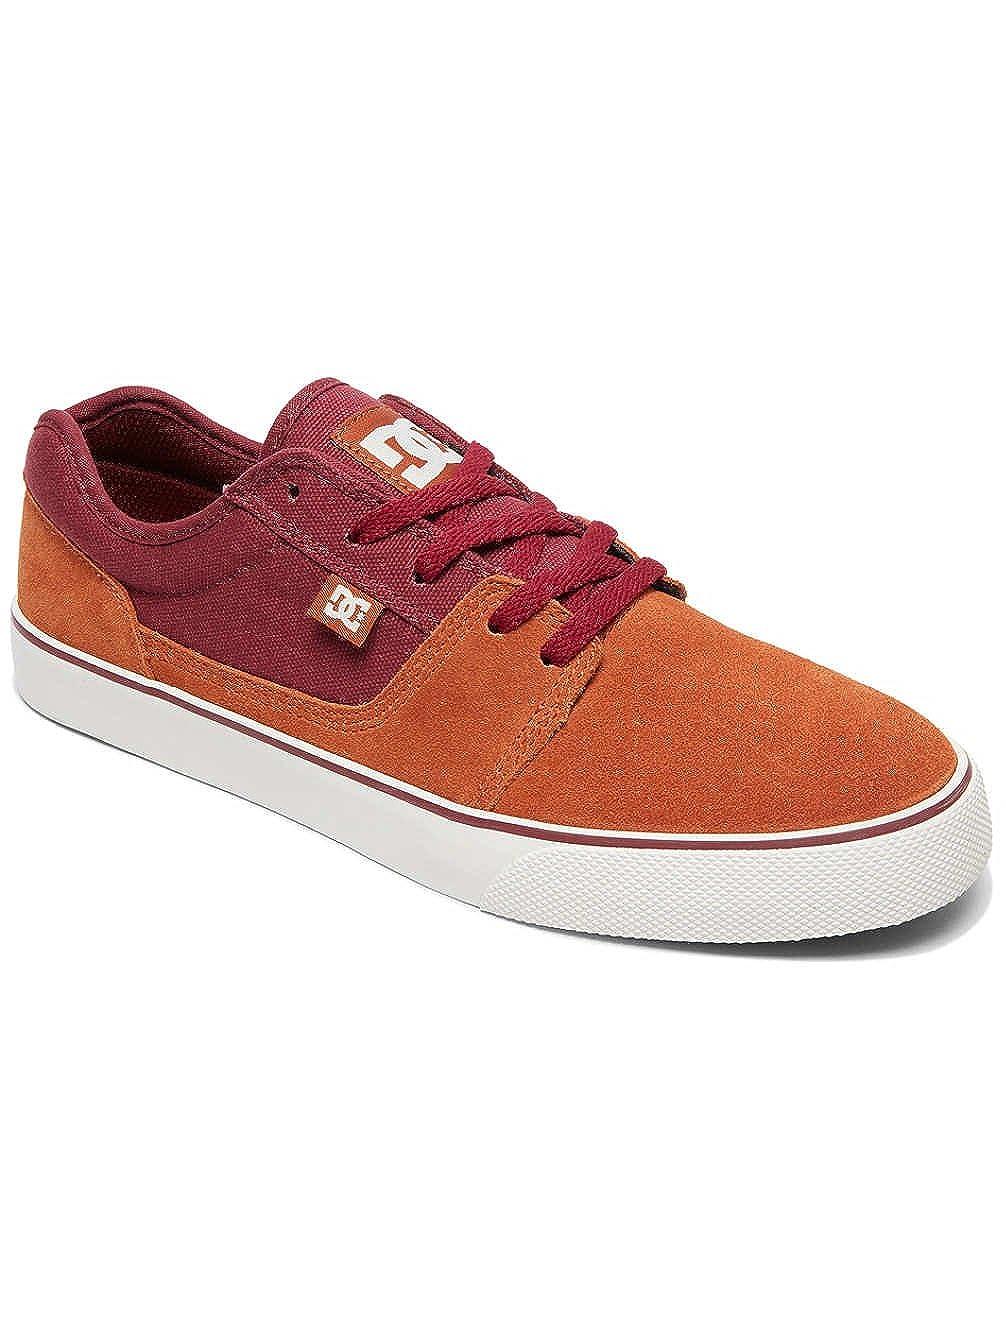 DC Shoes TONIK - Scarpe da Ginnastica Basse Uomo